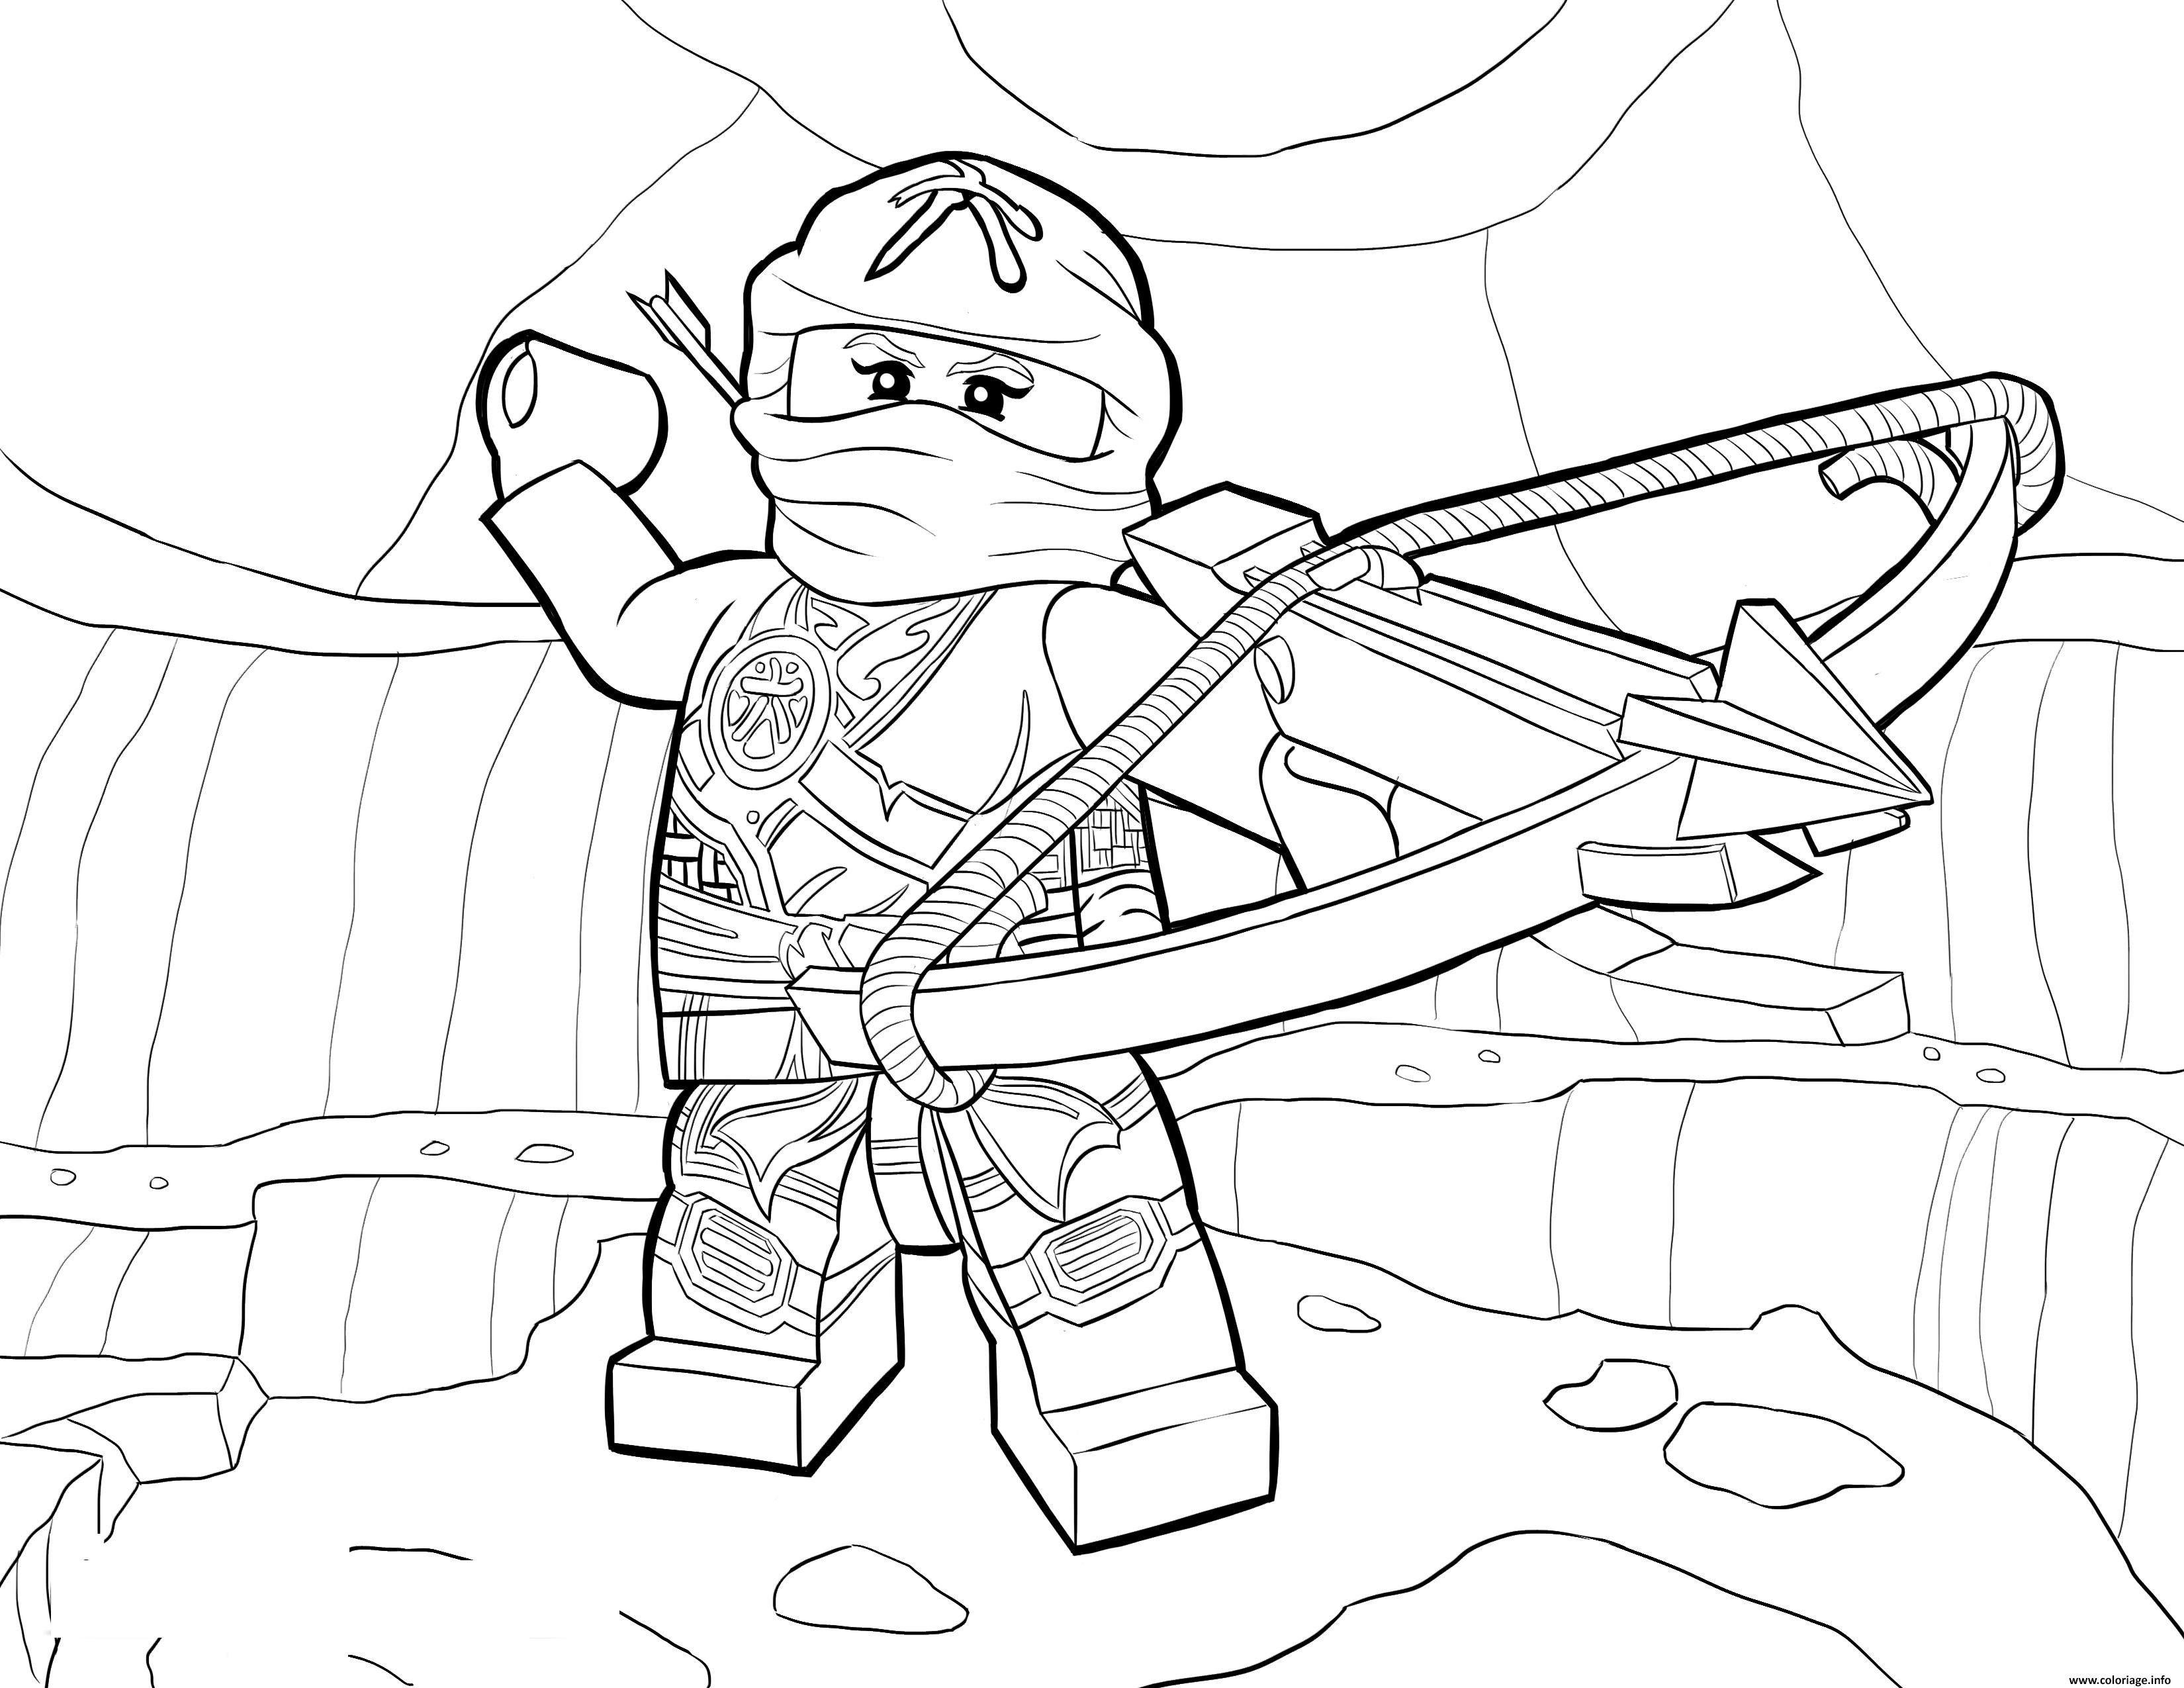 Jeux De Coloriage De Zombie Moderne Photographie Coloriage Lego Ninjago Skylor In Zukin Gi Dessin Malvorlagen Wenn Du Mal Buch Bastelvorlagen